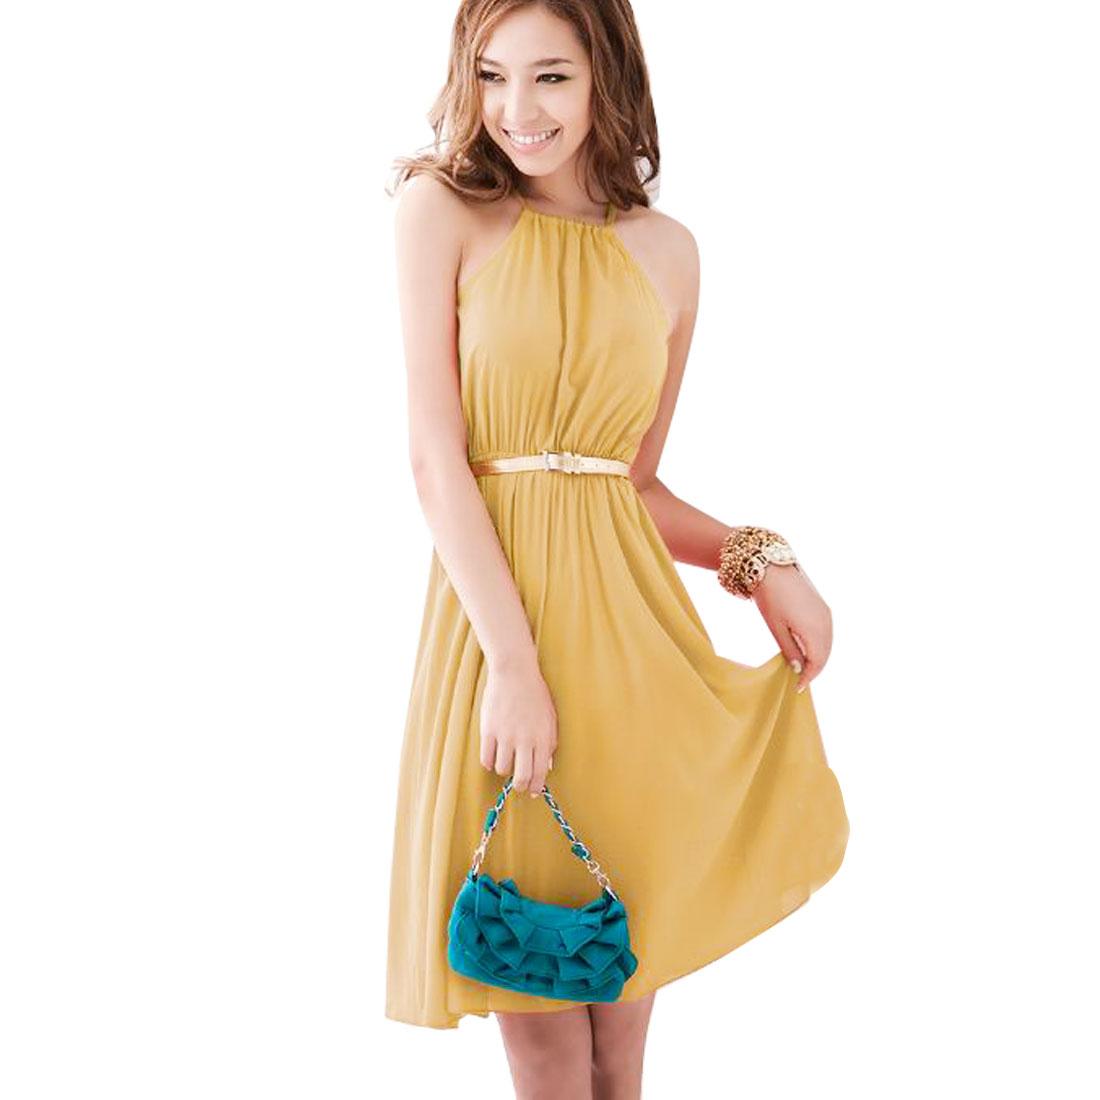 Women Self Tie Neck Sleeveless Semi Sheer Chiffon Mini Dress XS